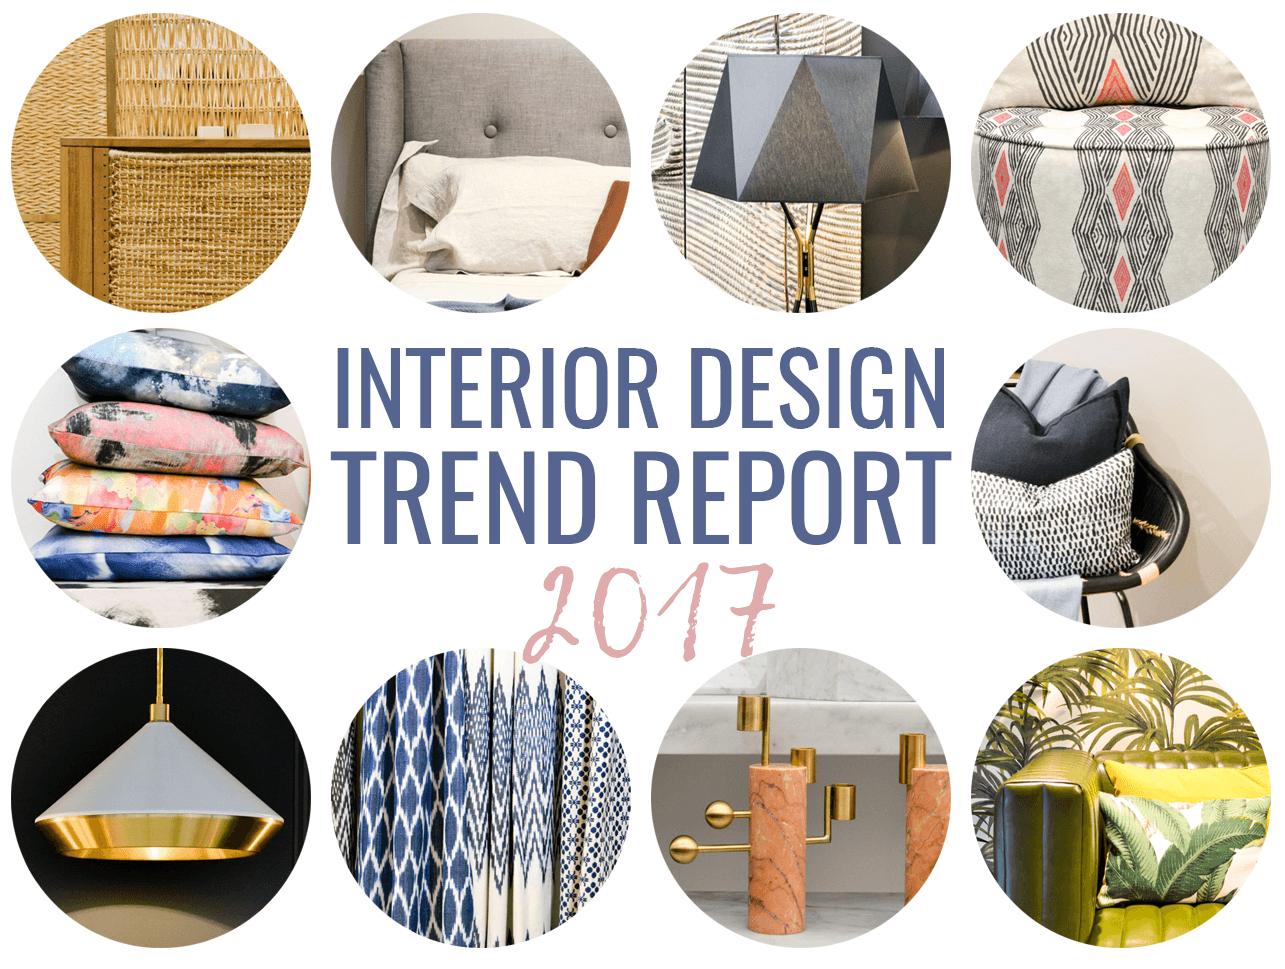 So Hot Right Now: 2017 Interior Design Trends Report